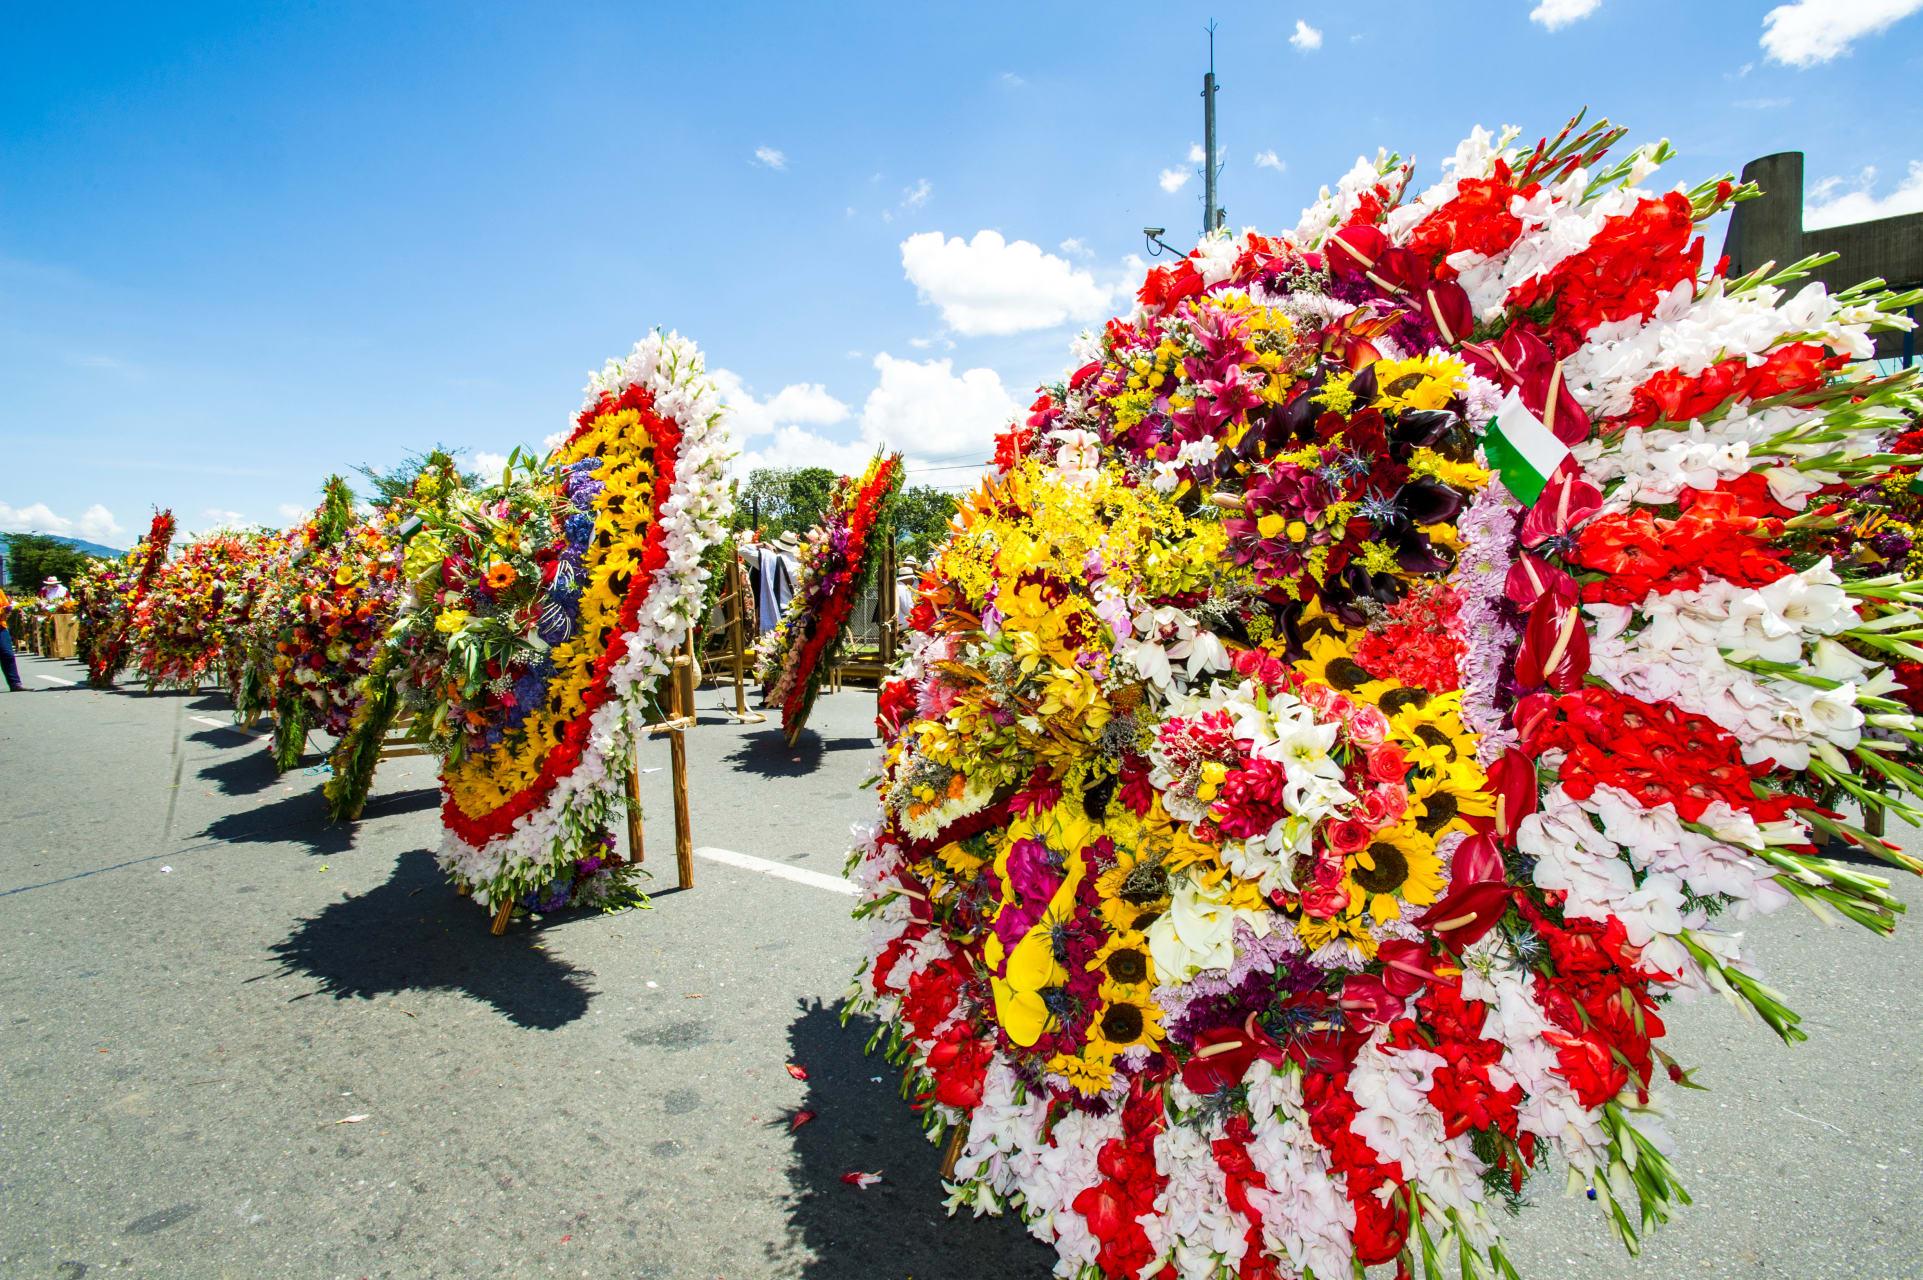 Medellín - Colombian Flower Festival in Medellin